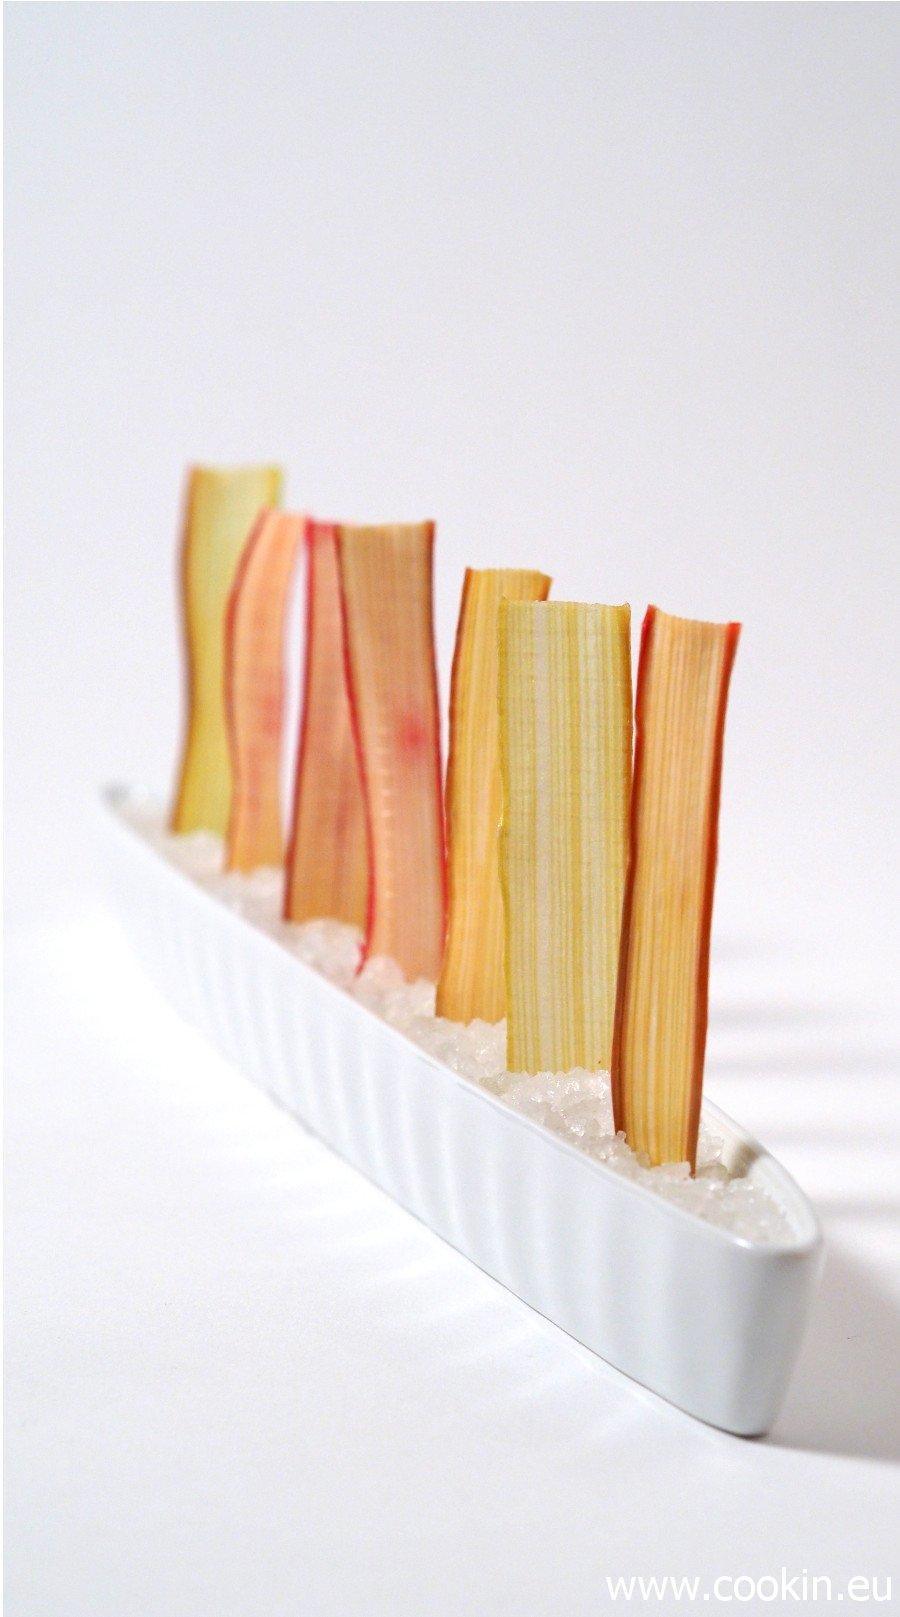 rhabarber-chips-7-900-hk